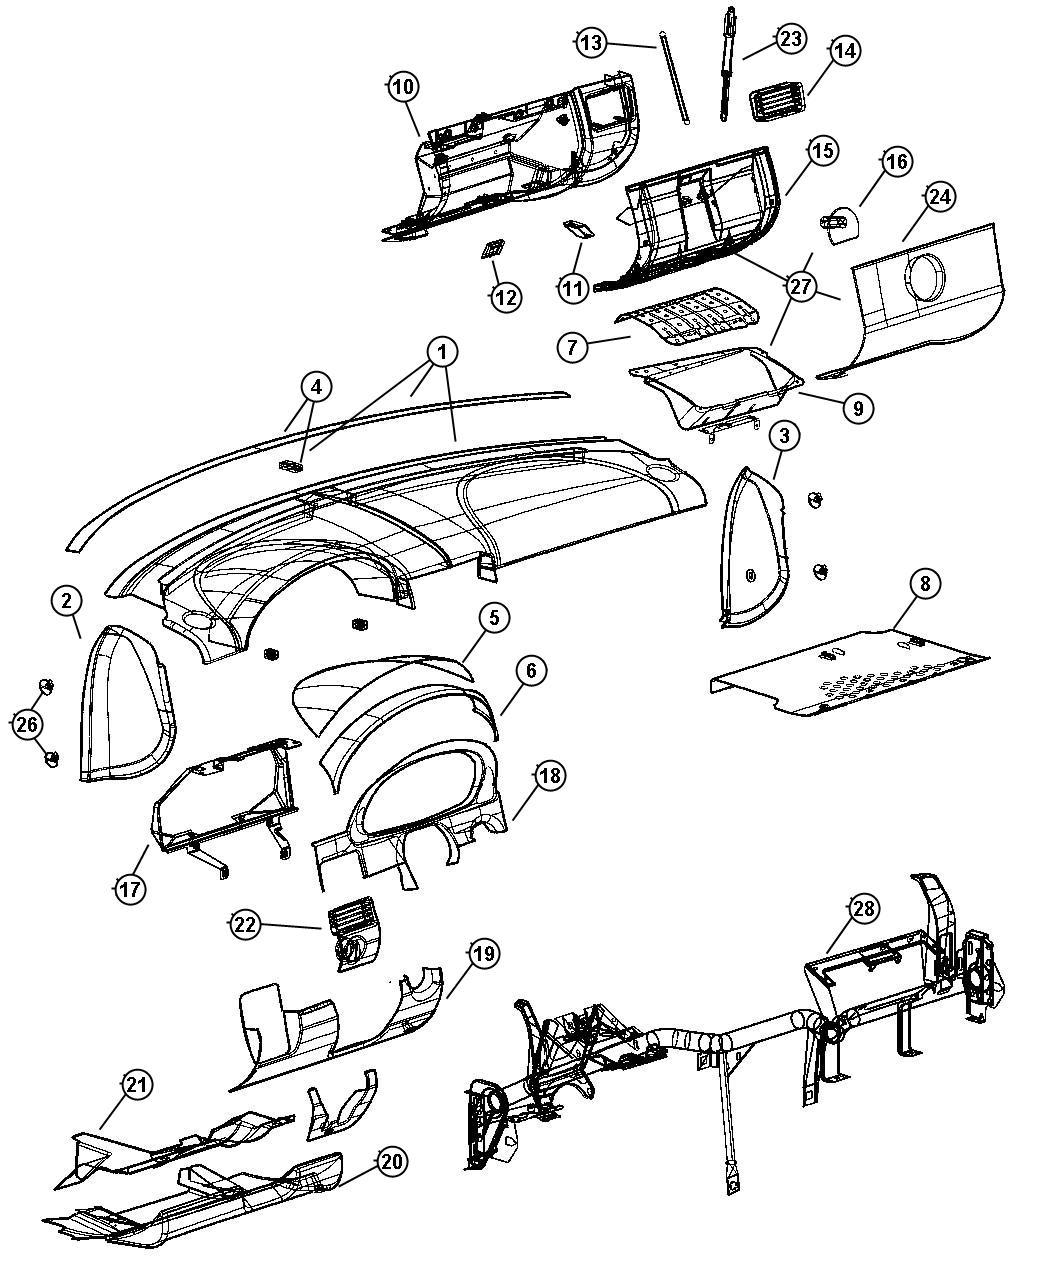 Chrysler Crossfire Cover. Export. Instrument panel